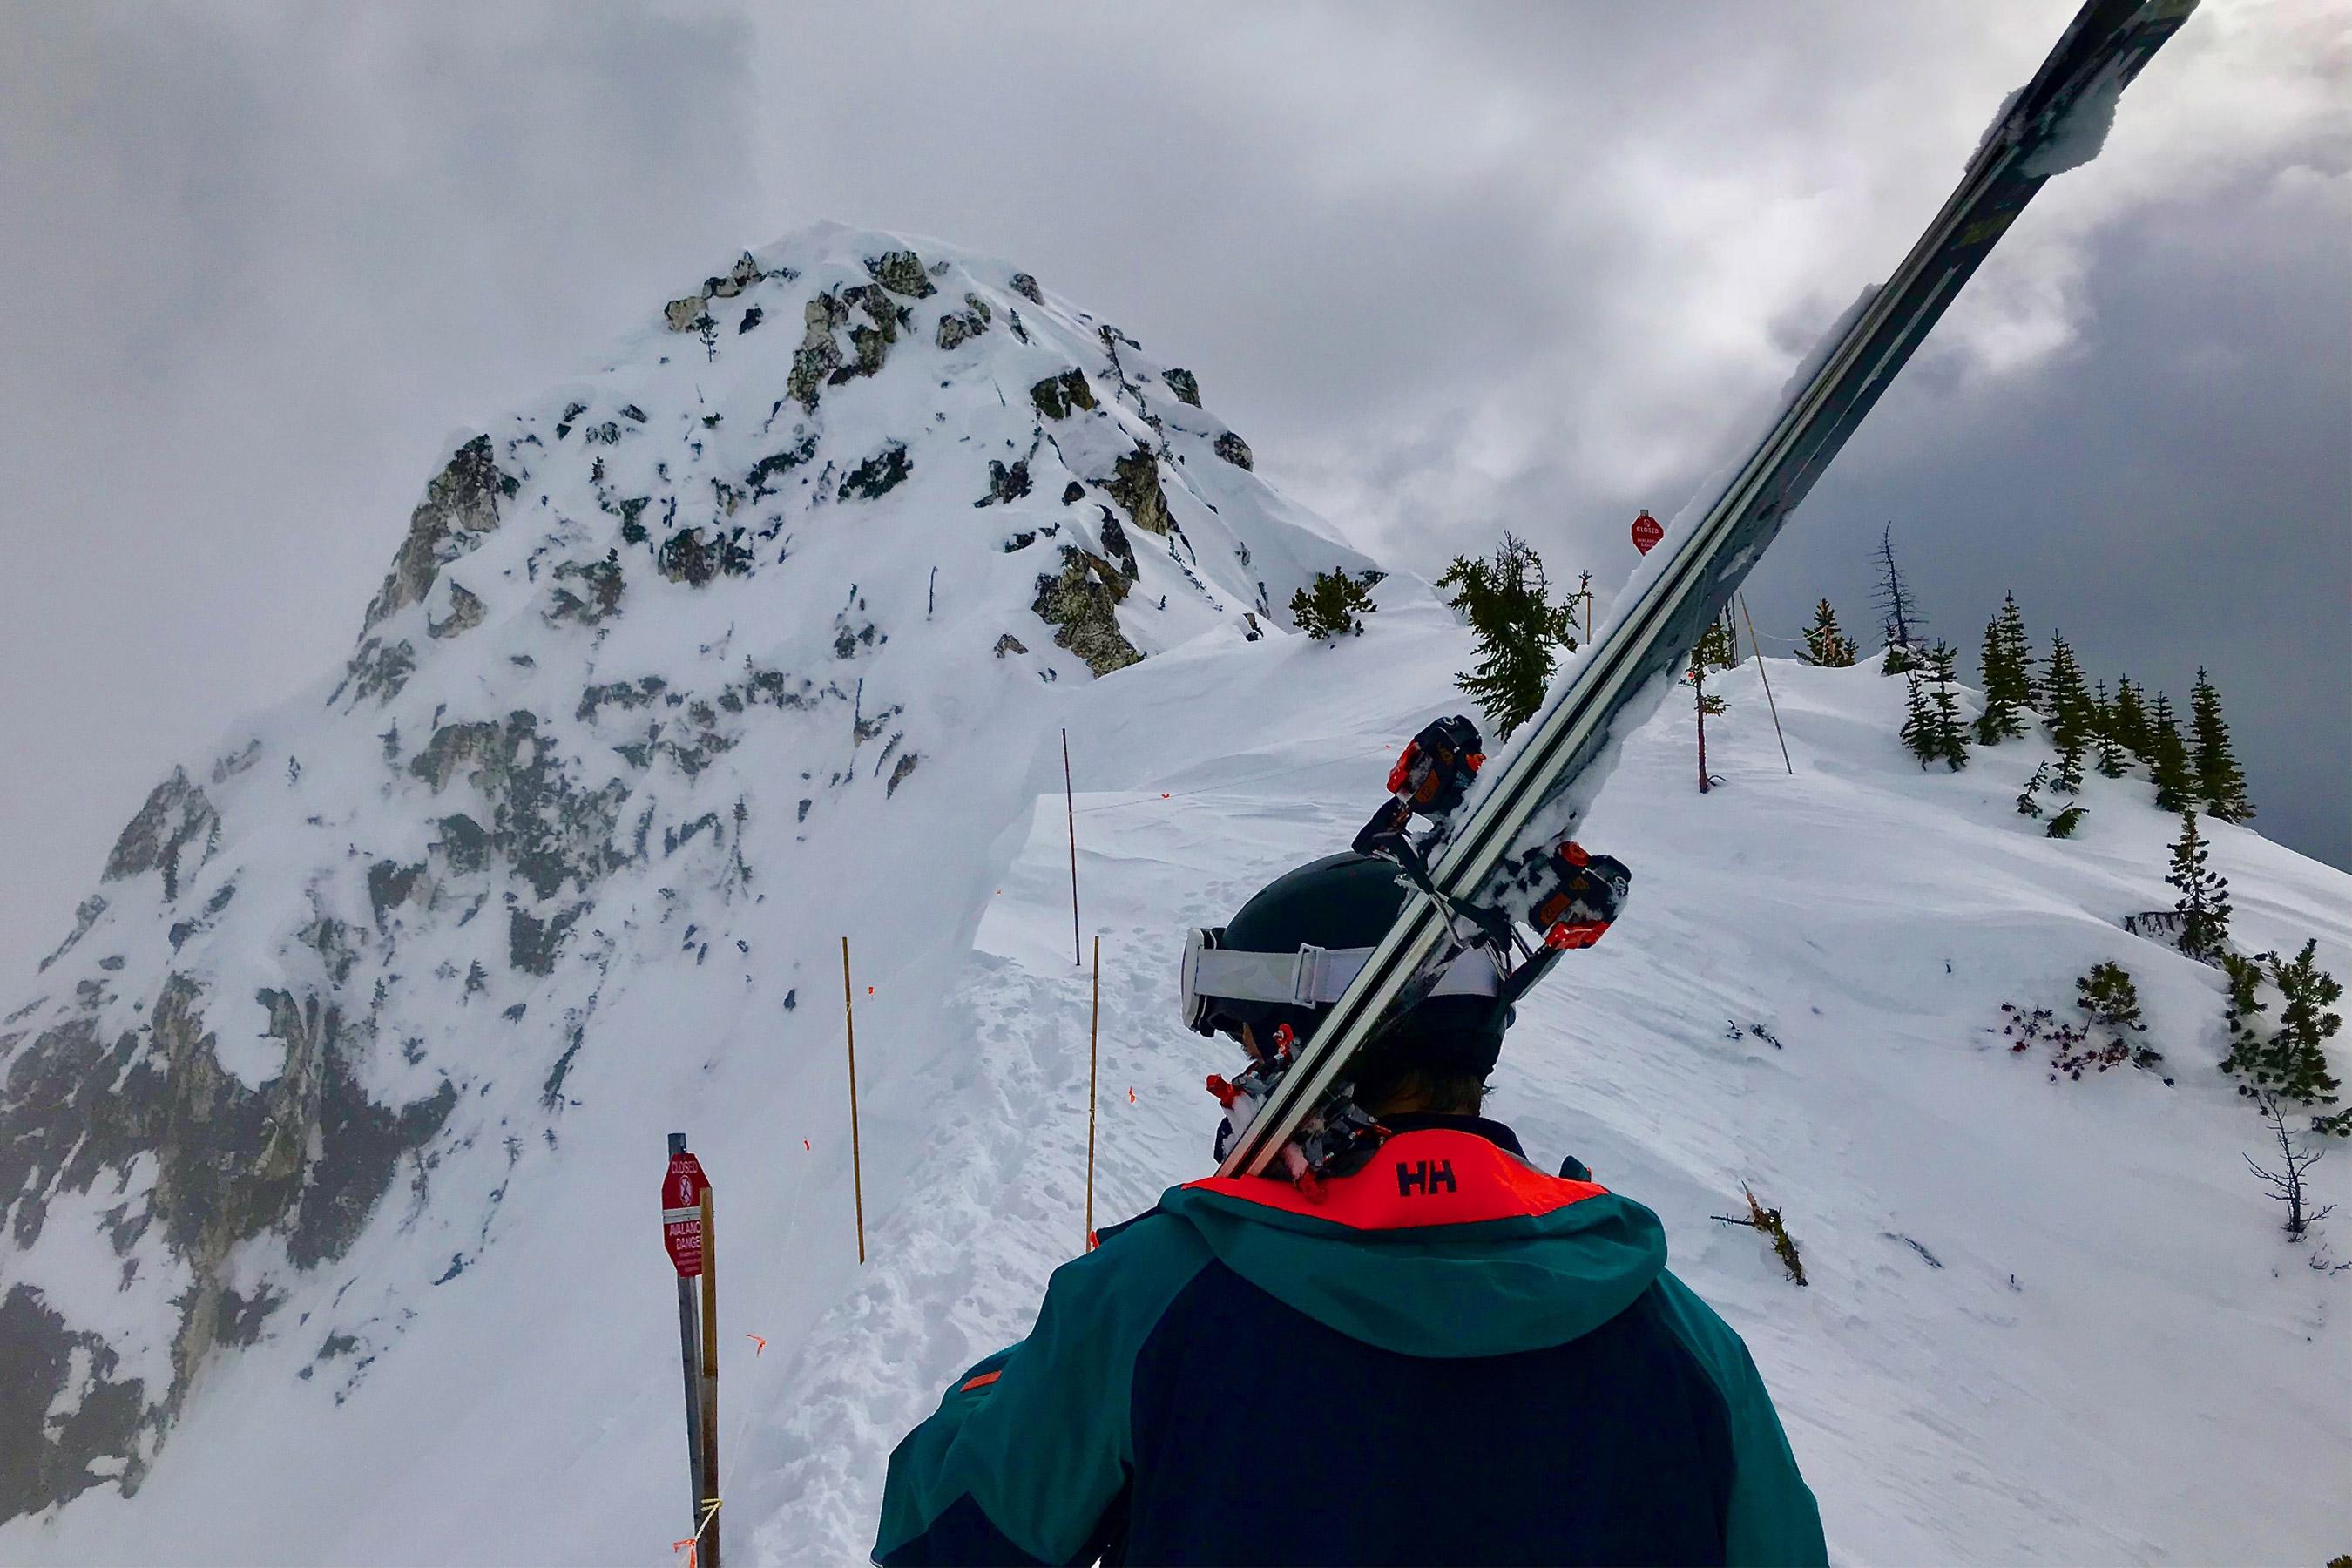 skier wearing hooded ski jacket